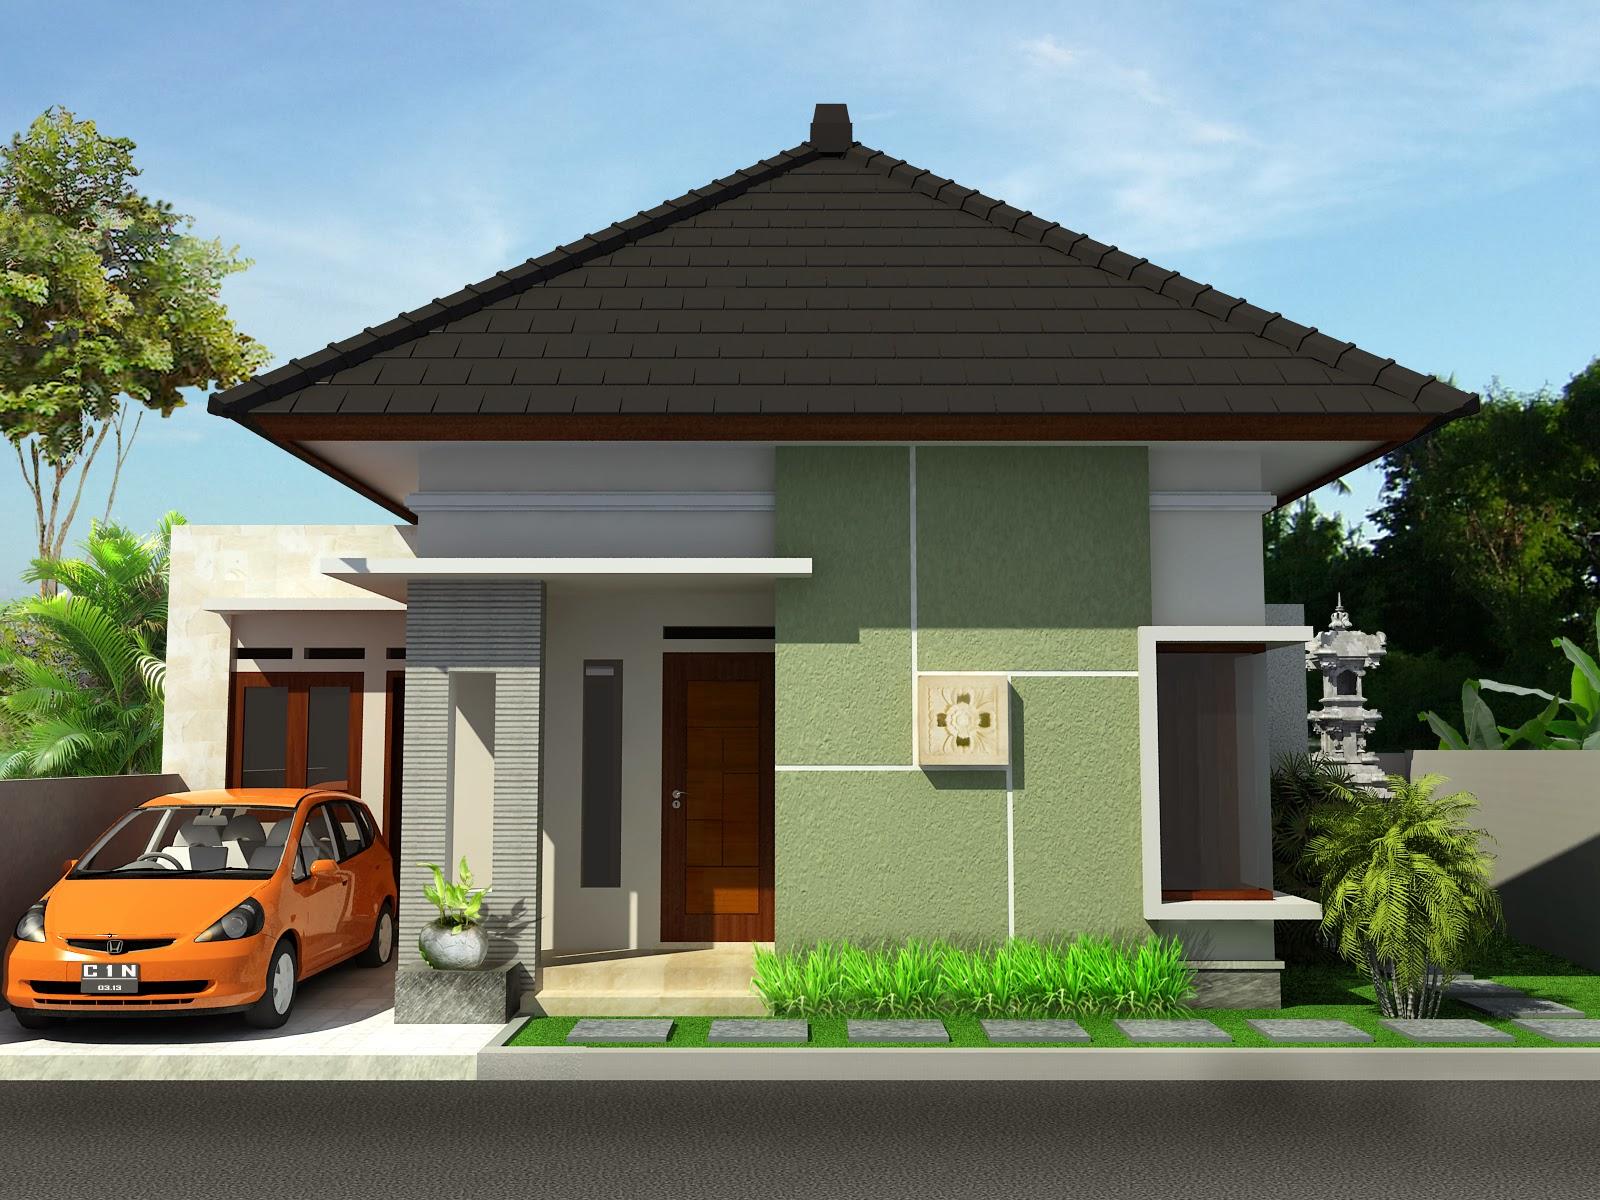 60 Desain Rumah Minimalis Modern 1 Lantai Type 45 Terbaru ...